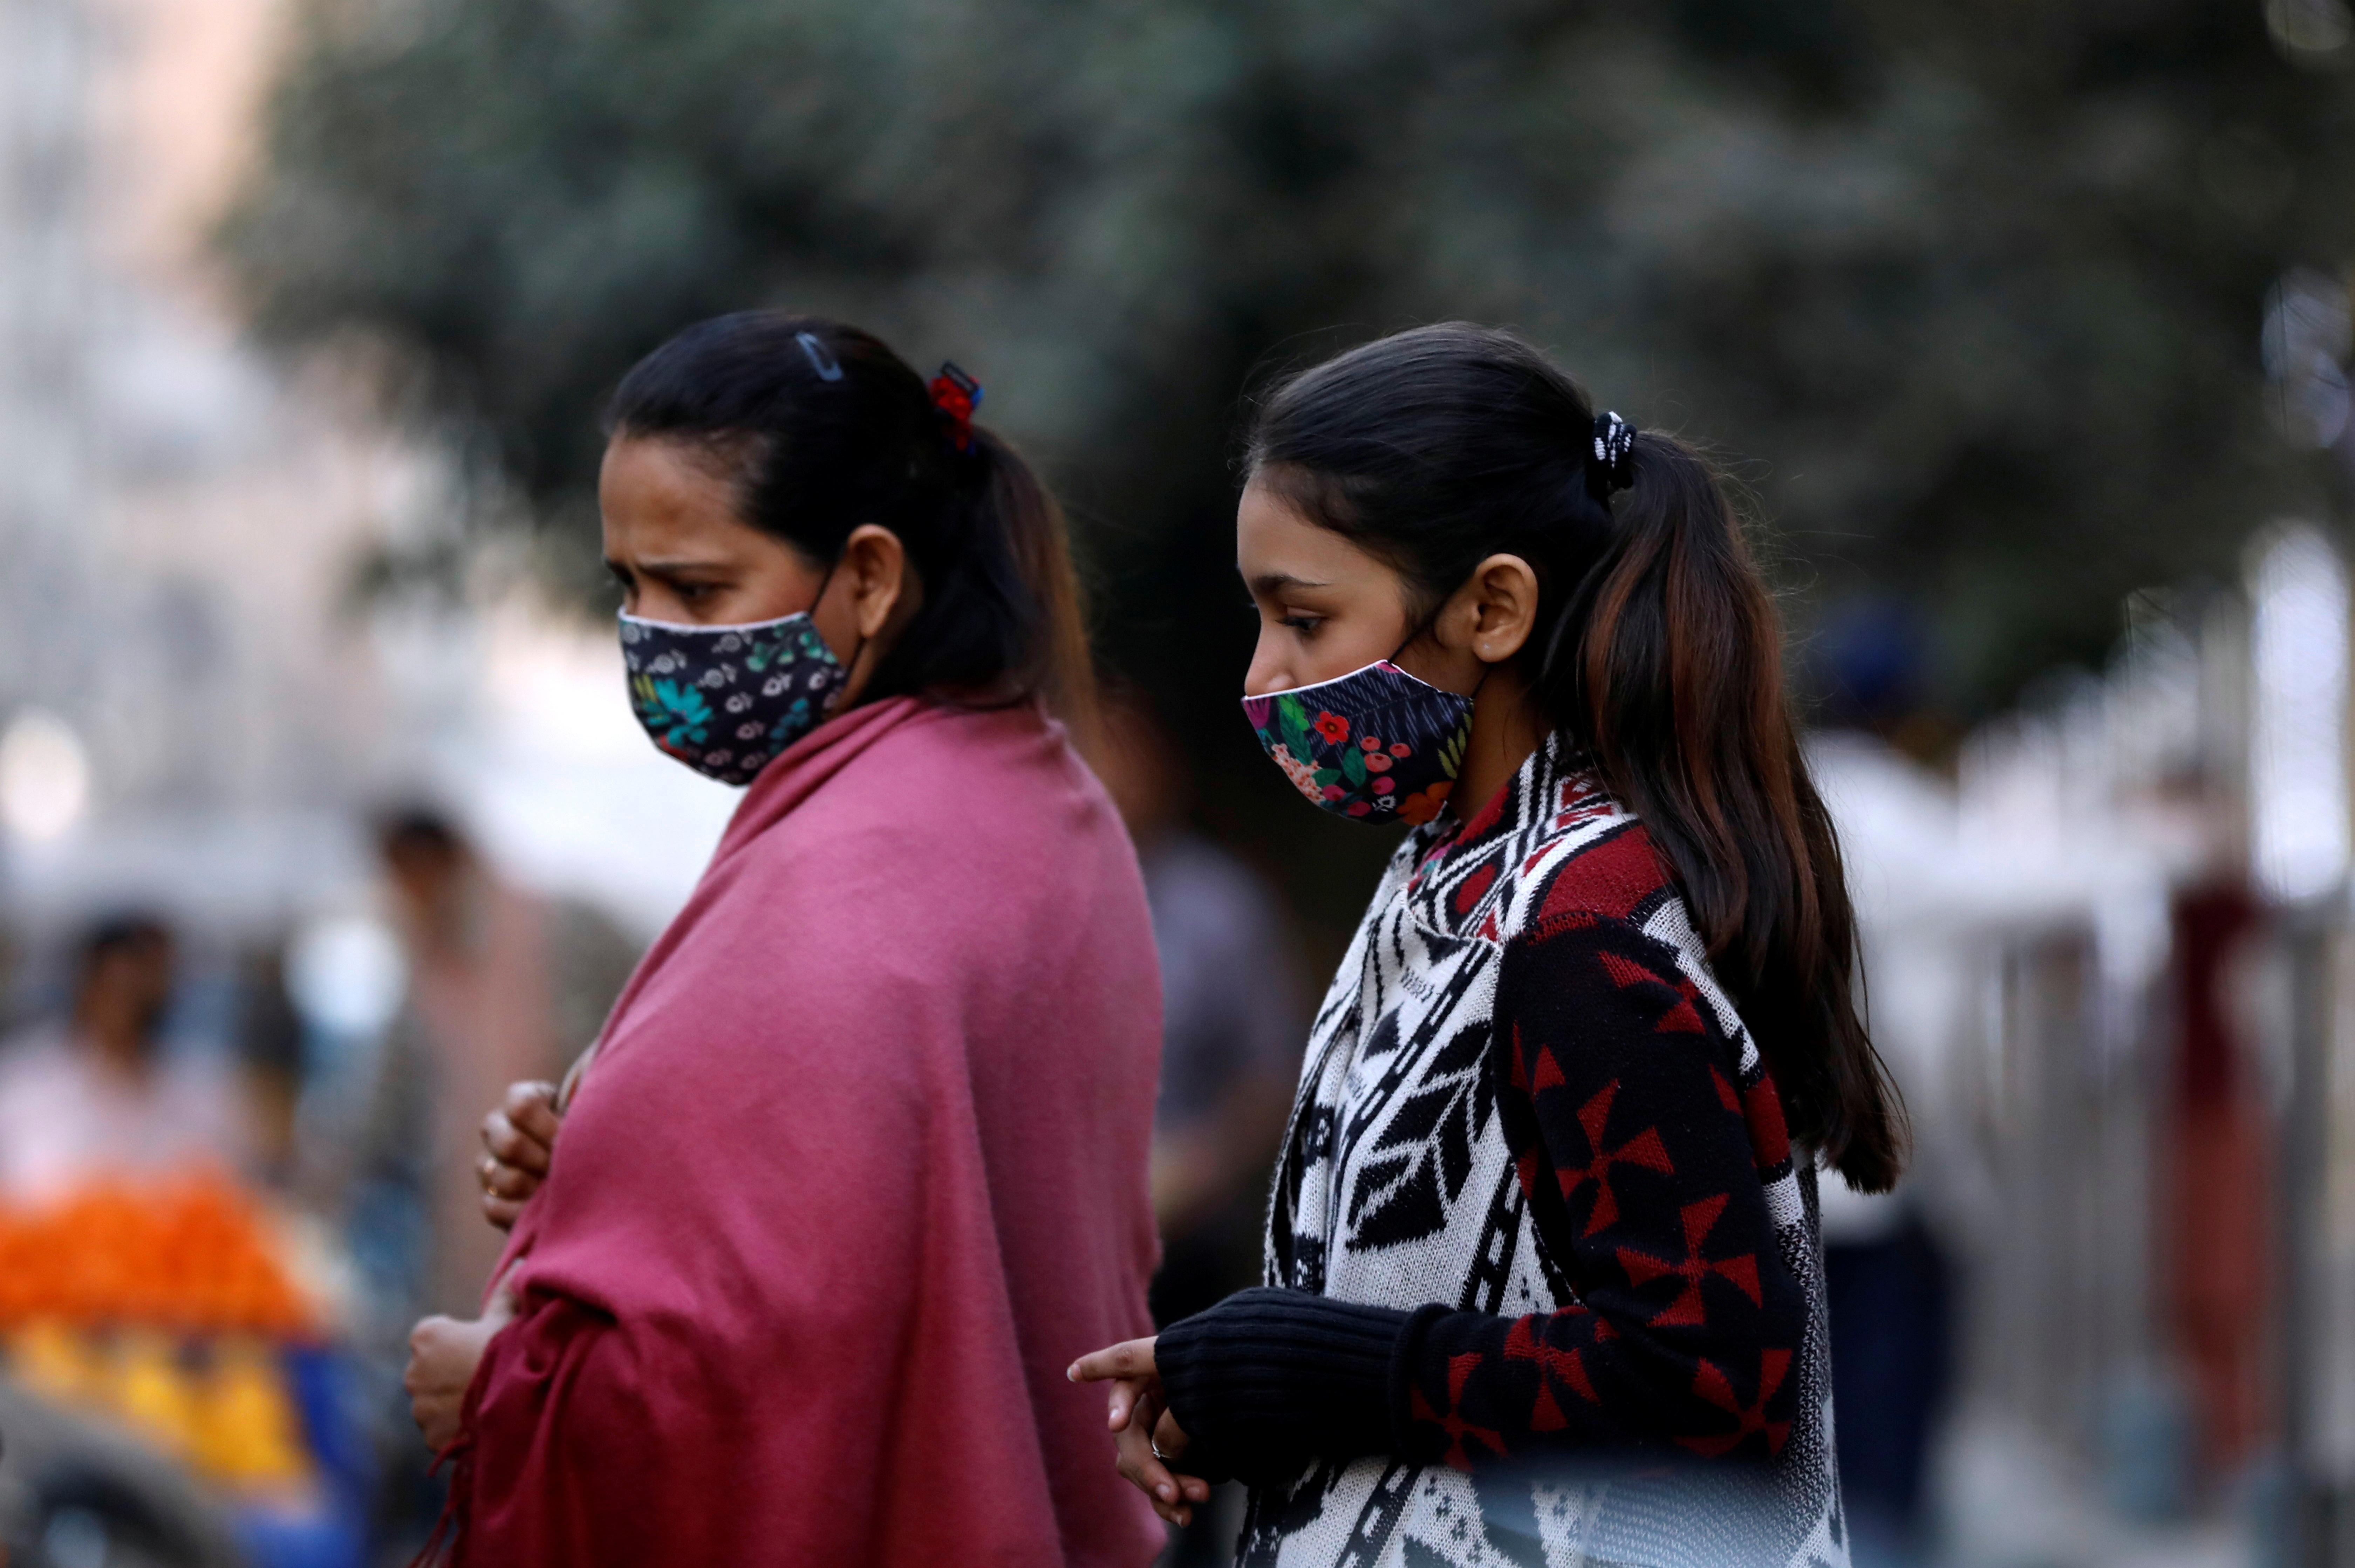 Women wearing masks during COVID-19